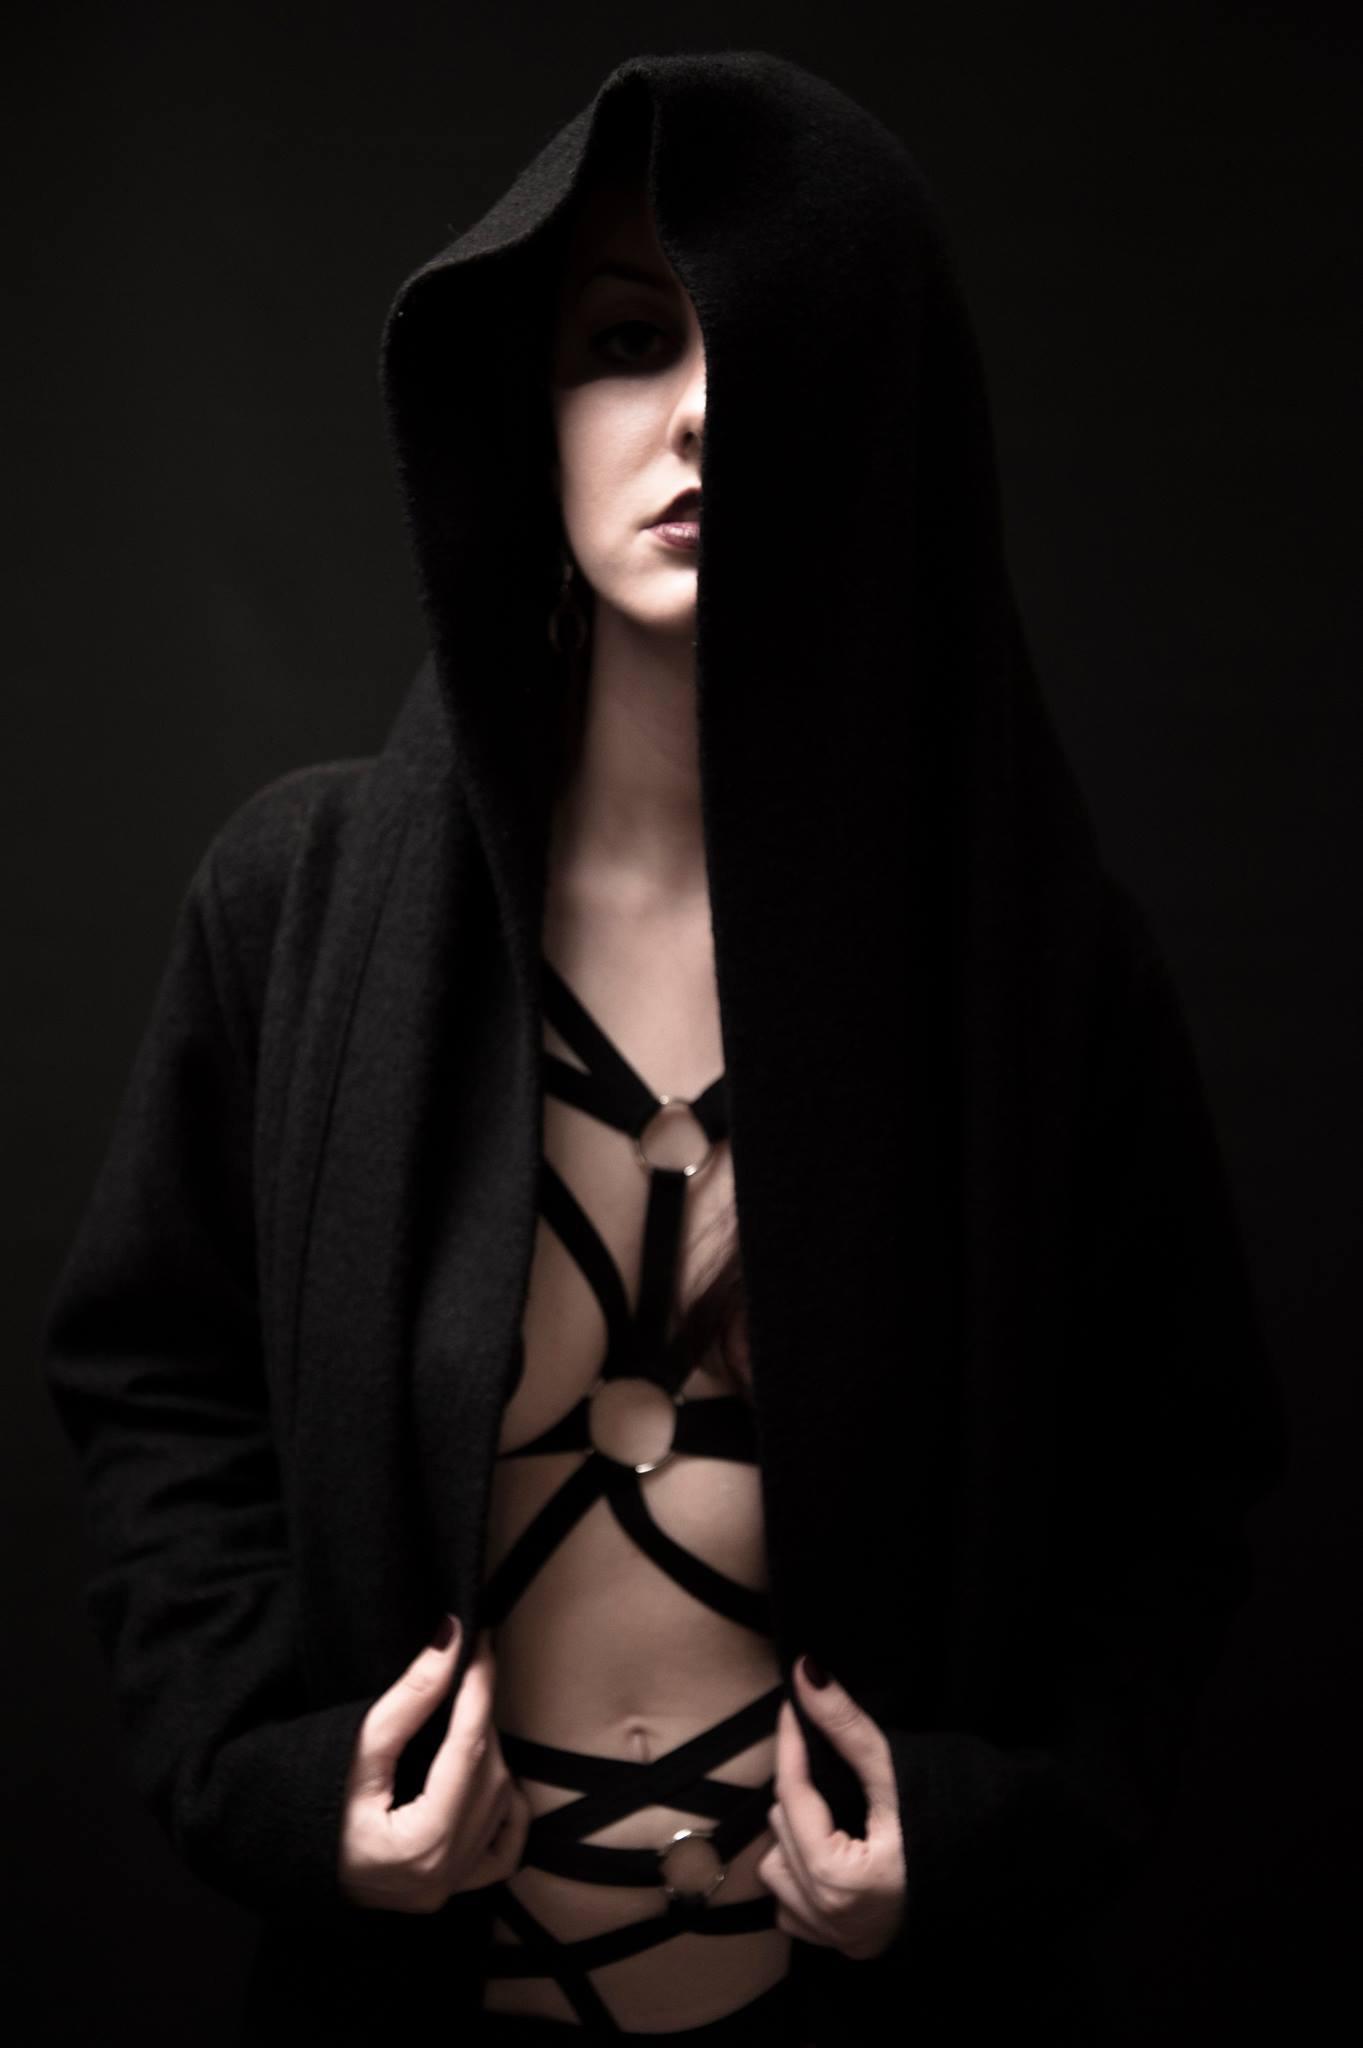 Photographer: Thom Axon